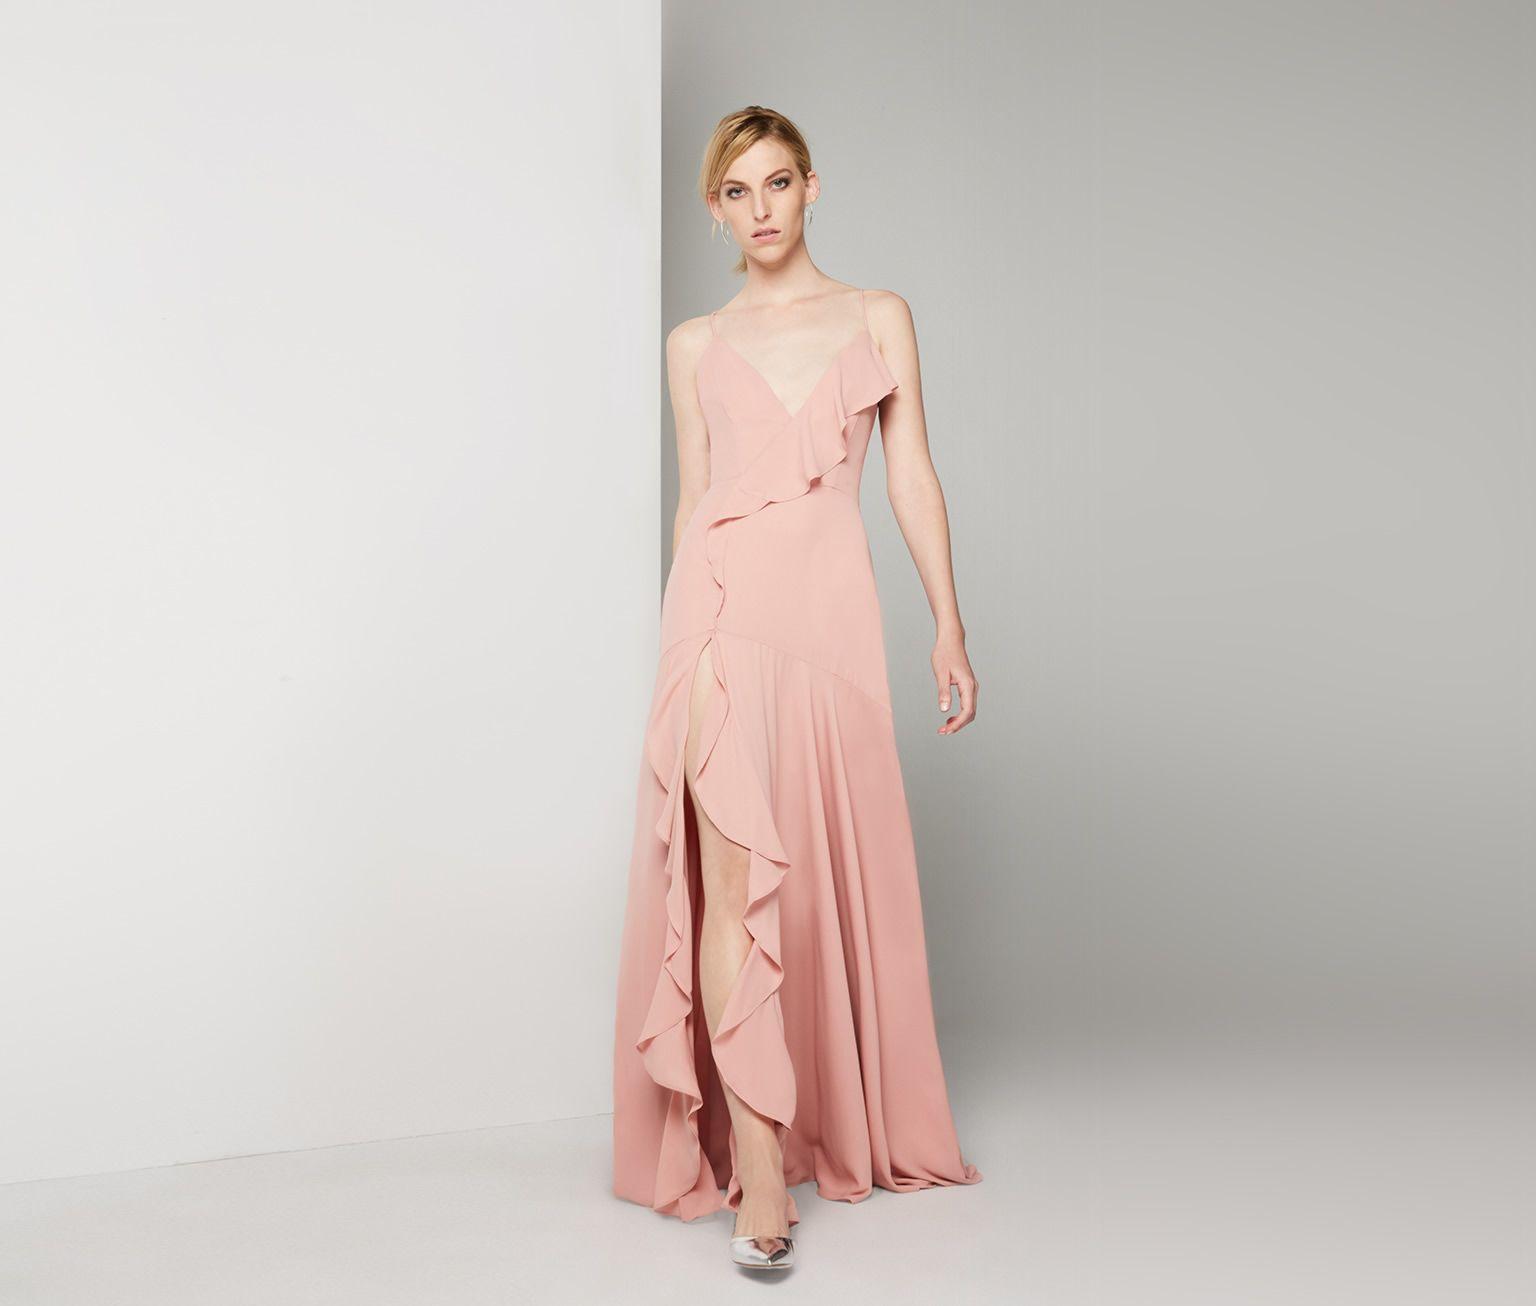 The Callais Dress | Pinterest | Gray, Dresses dresses and Wardrobes